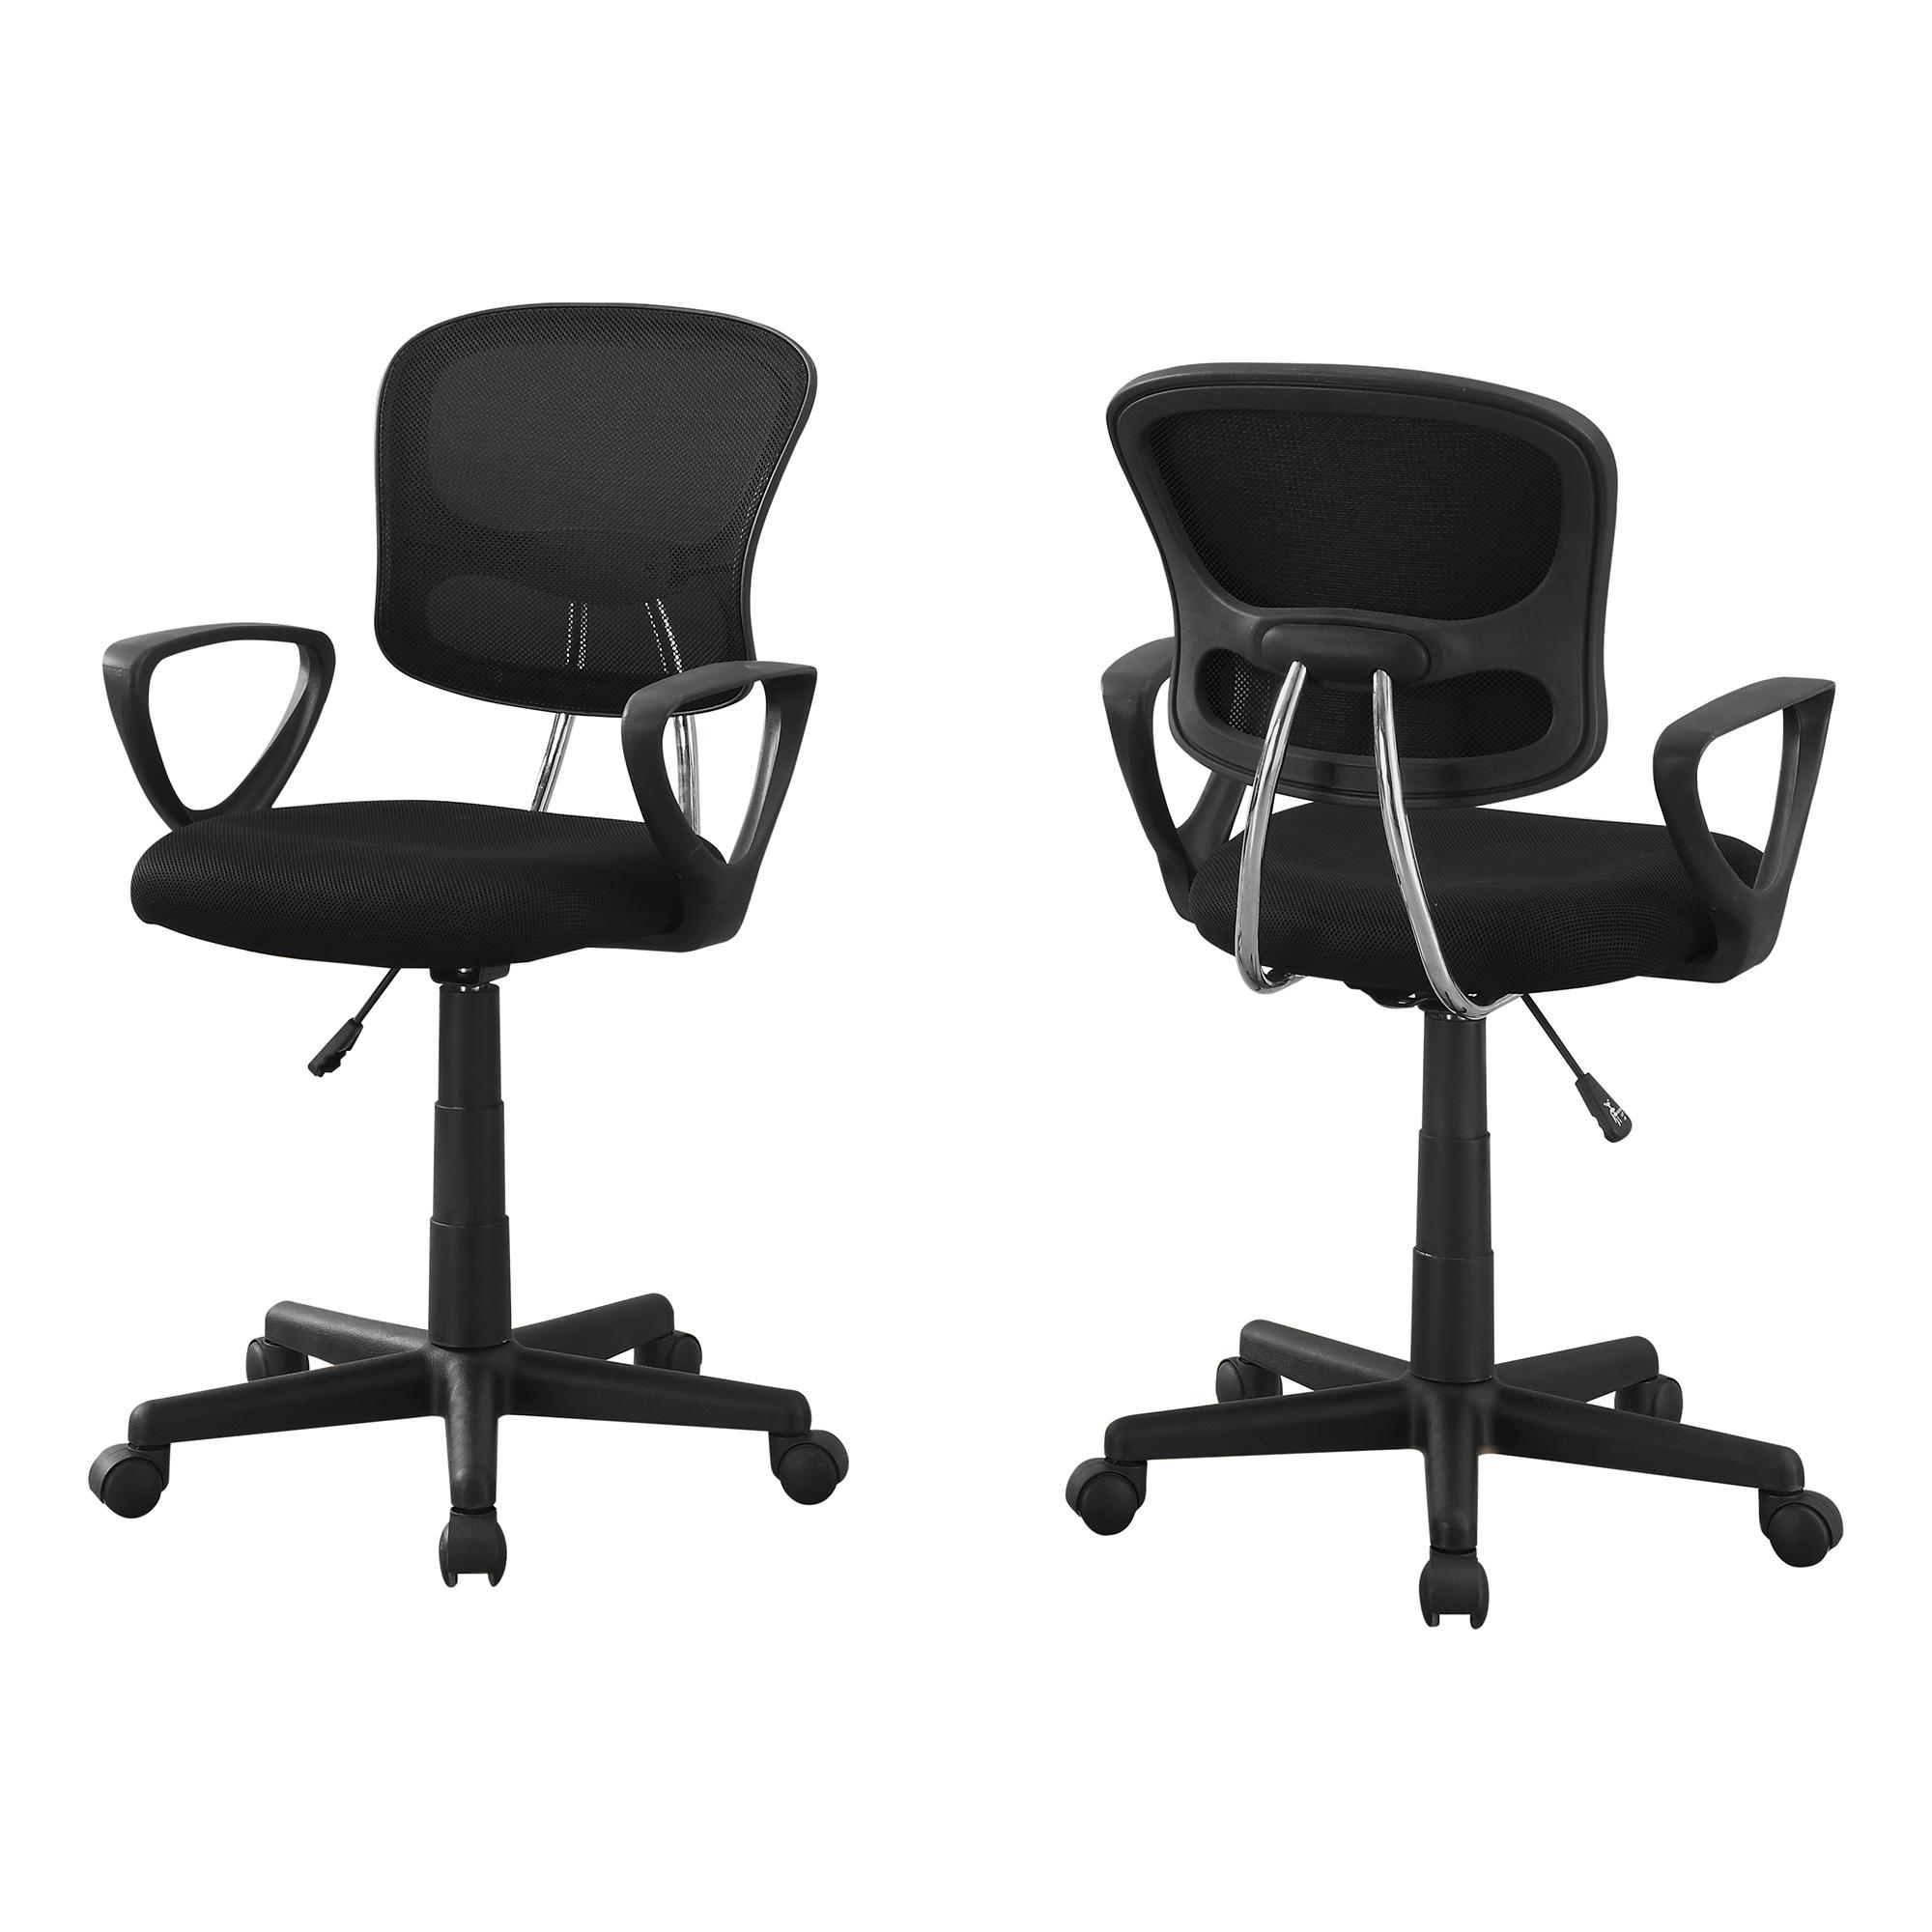 "21.5"" x 23"" x 33"" Black Foam Metal Polypropylene Polyester  Office Chair"